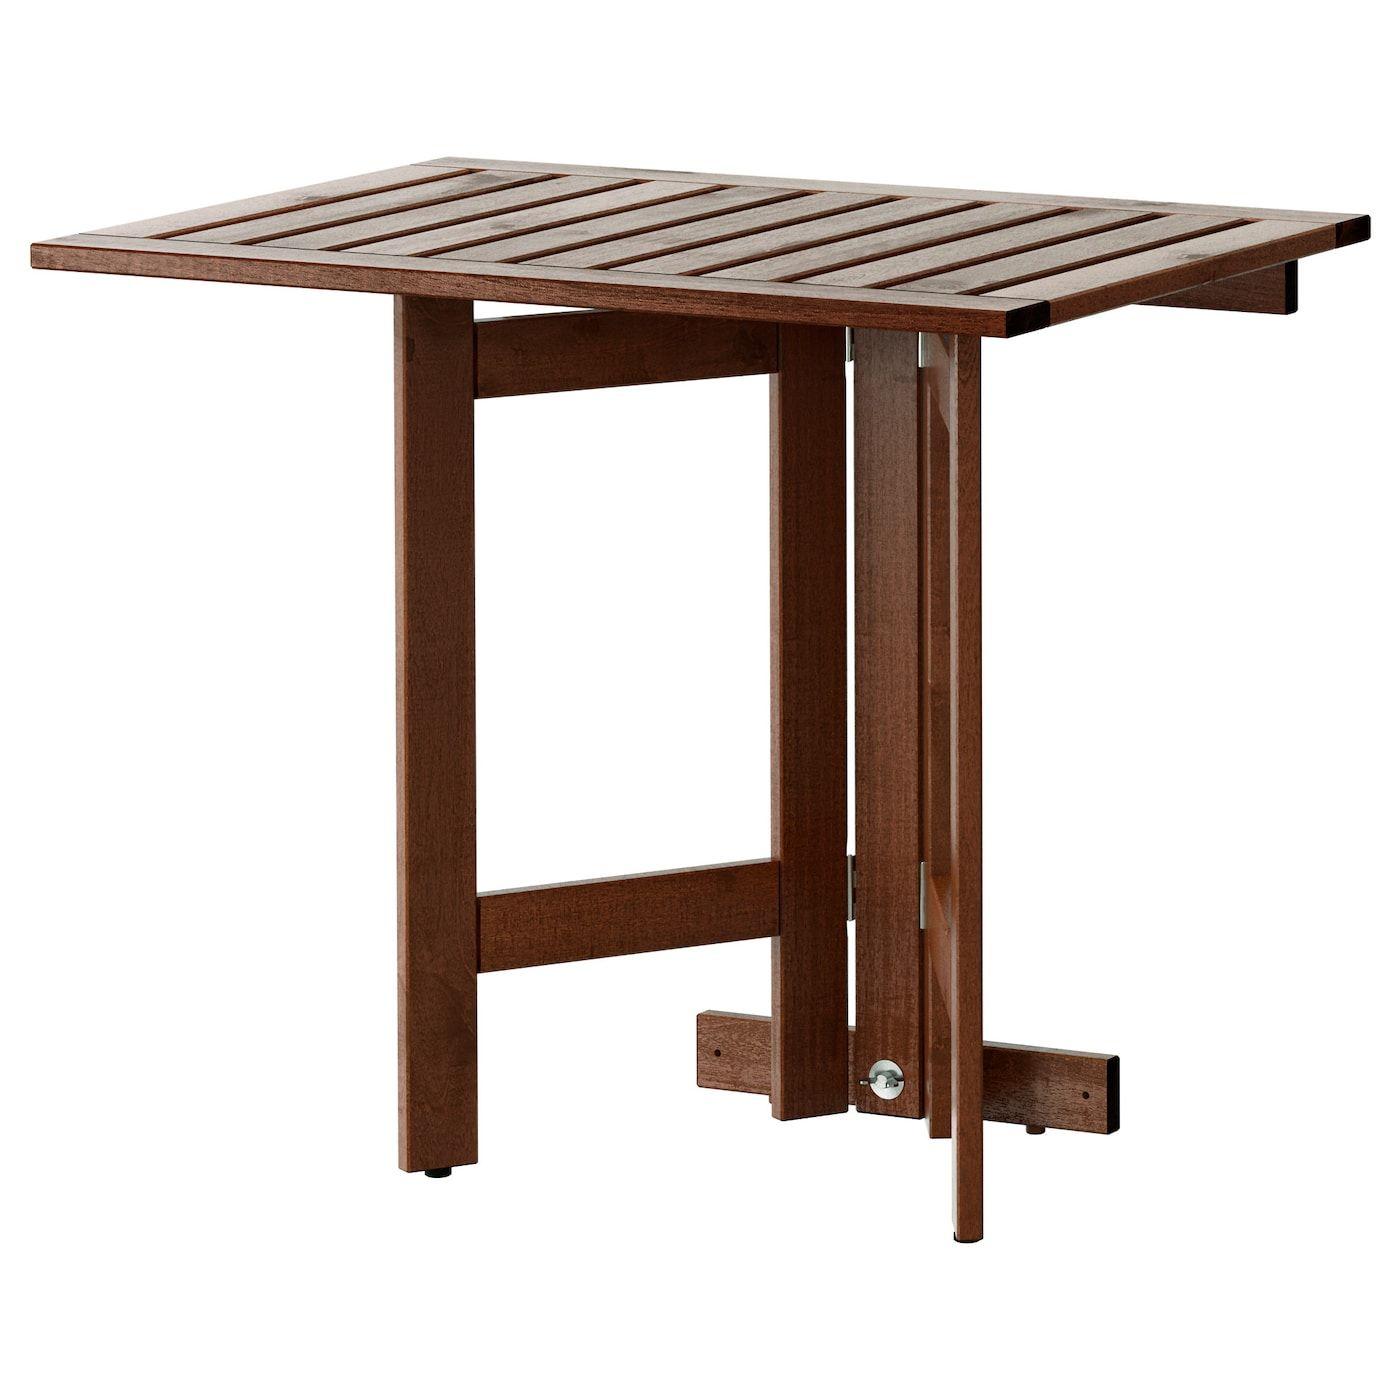 Applaro Lehajthato Fali Asztal Kulteri Barna Pacolt 80x56 Cm